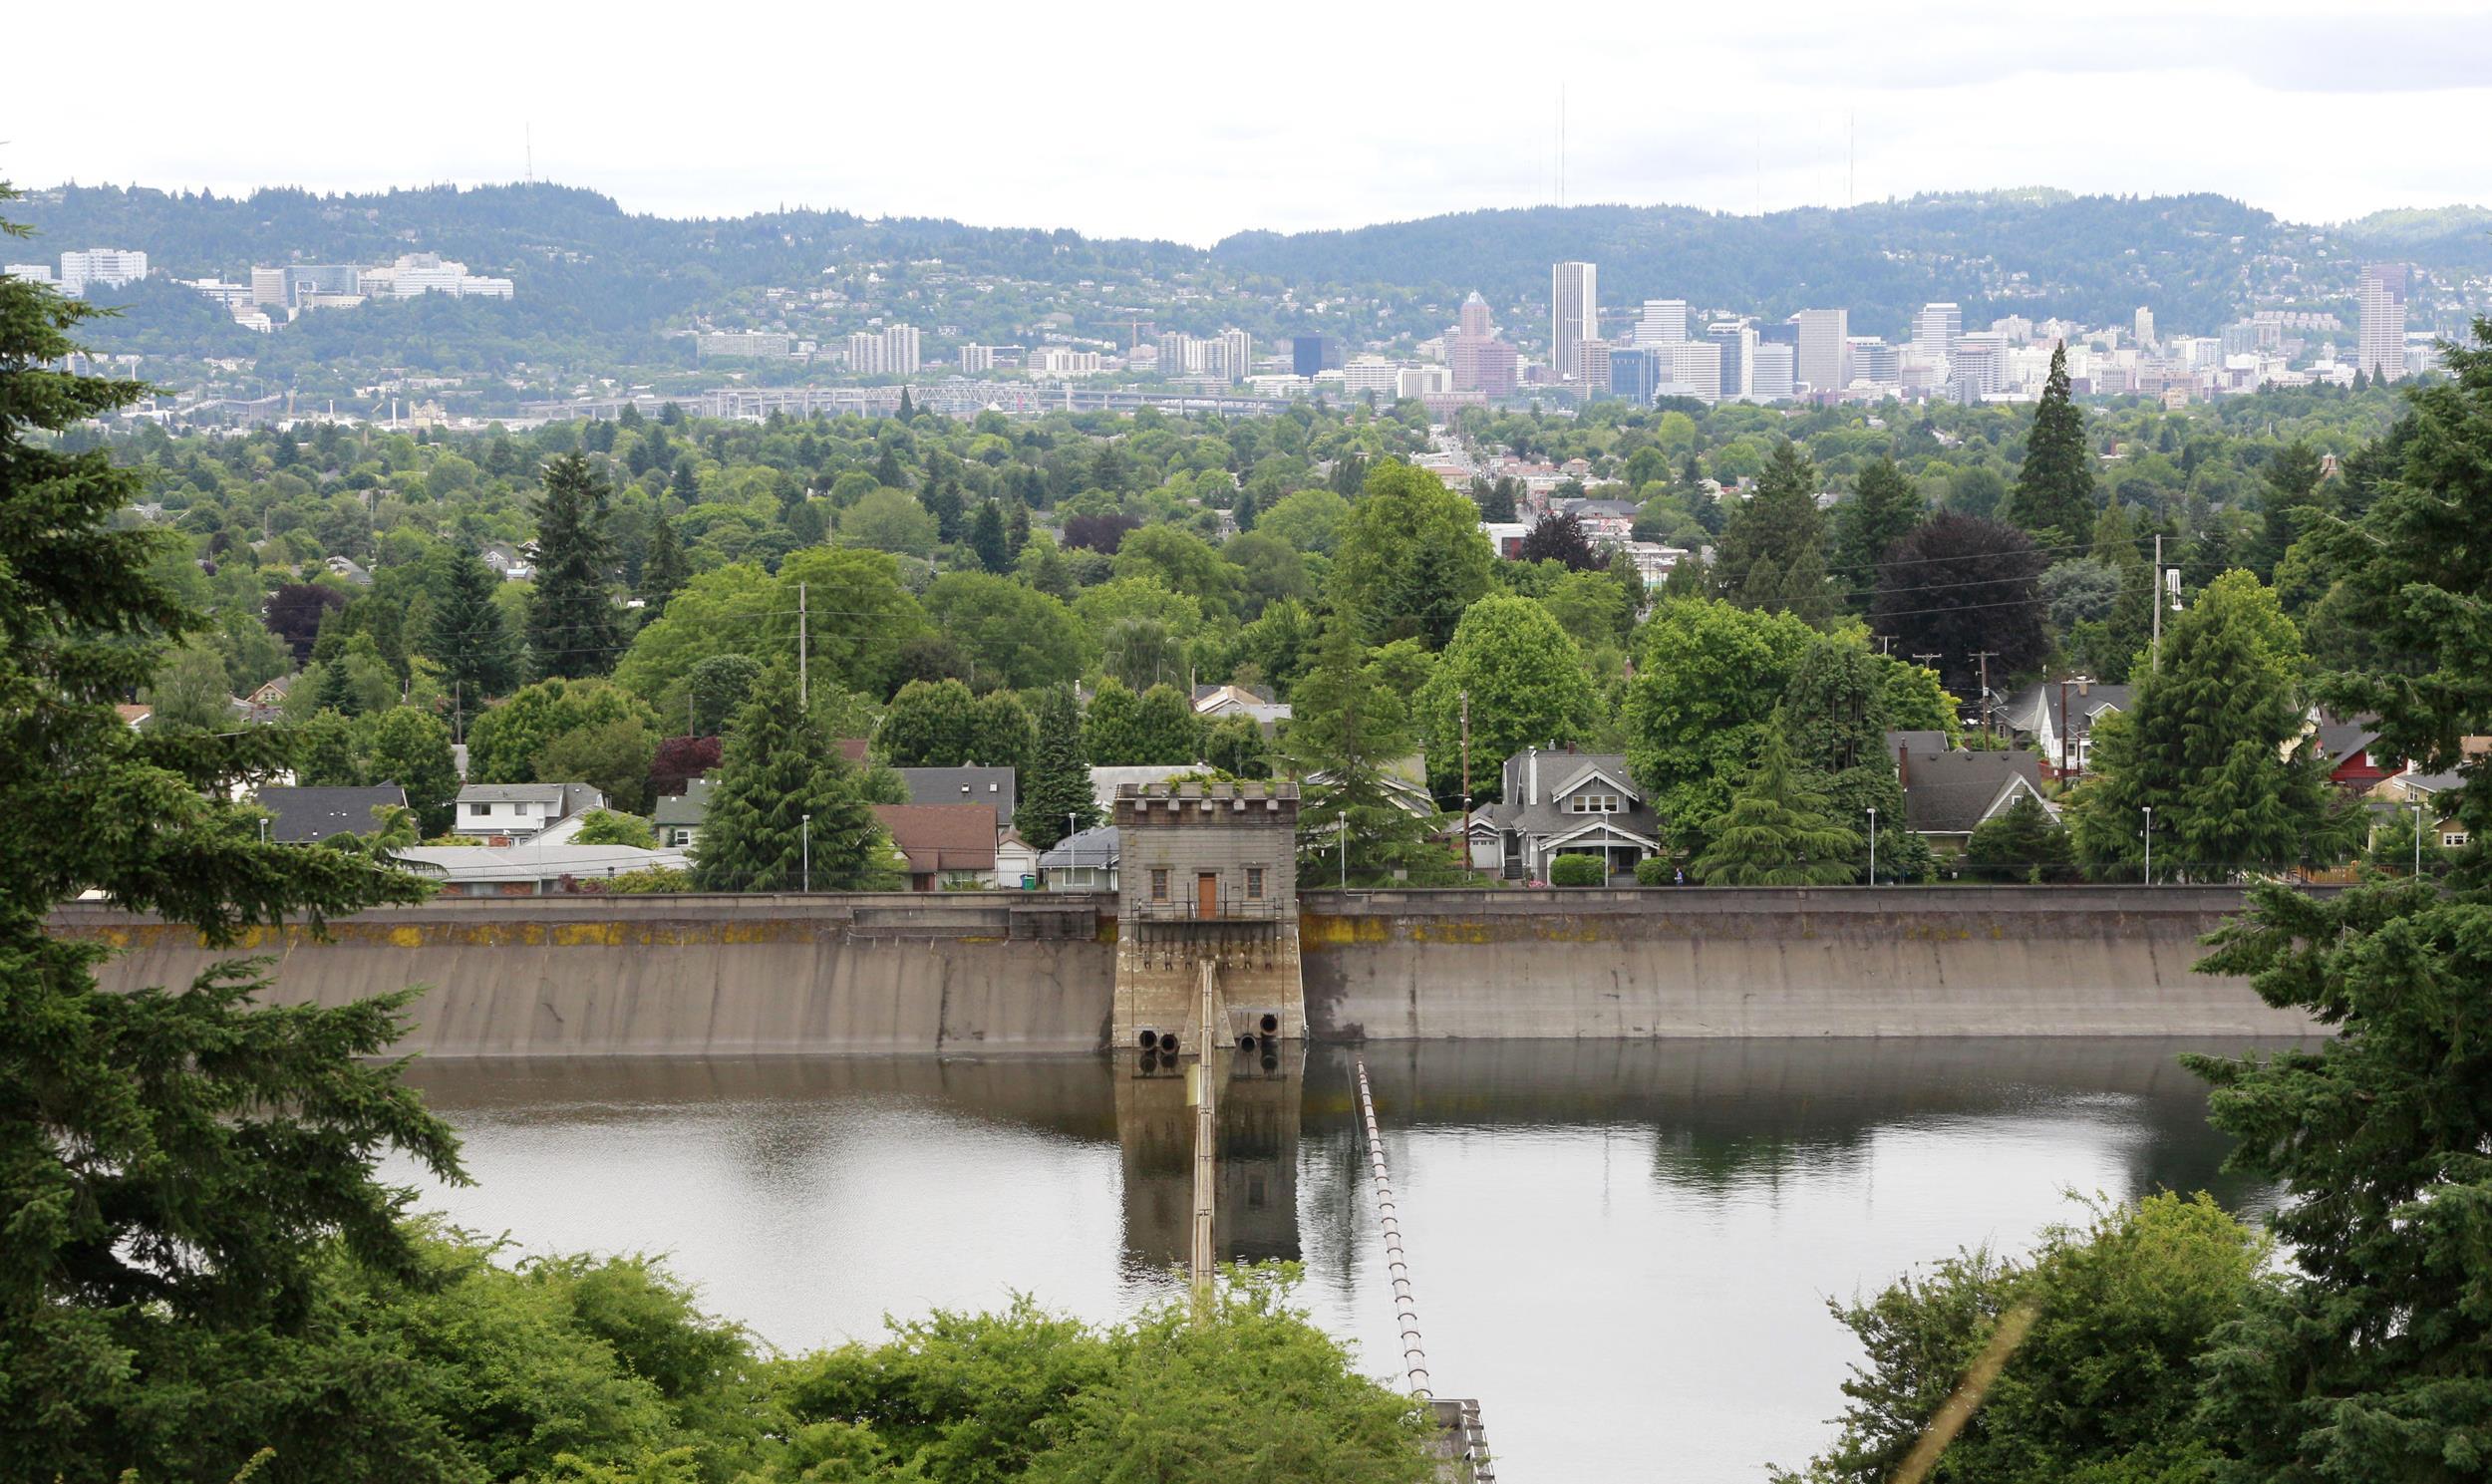 Image: A water reservoir in Mount Tabor Park in Portland, Ore., in 2011.